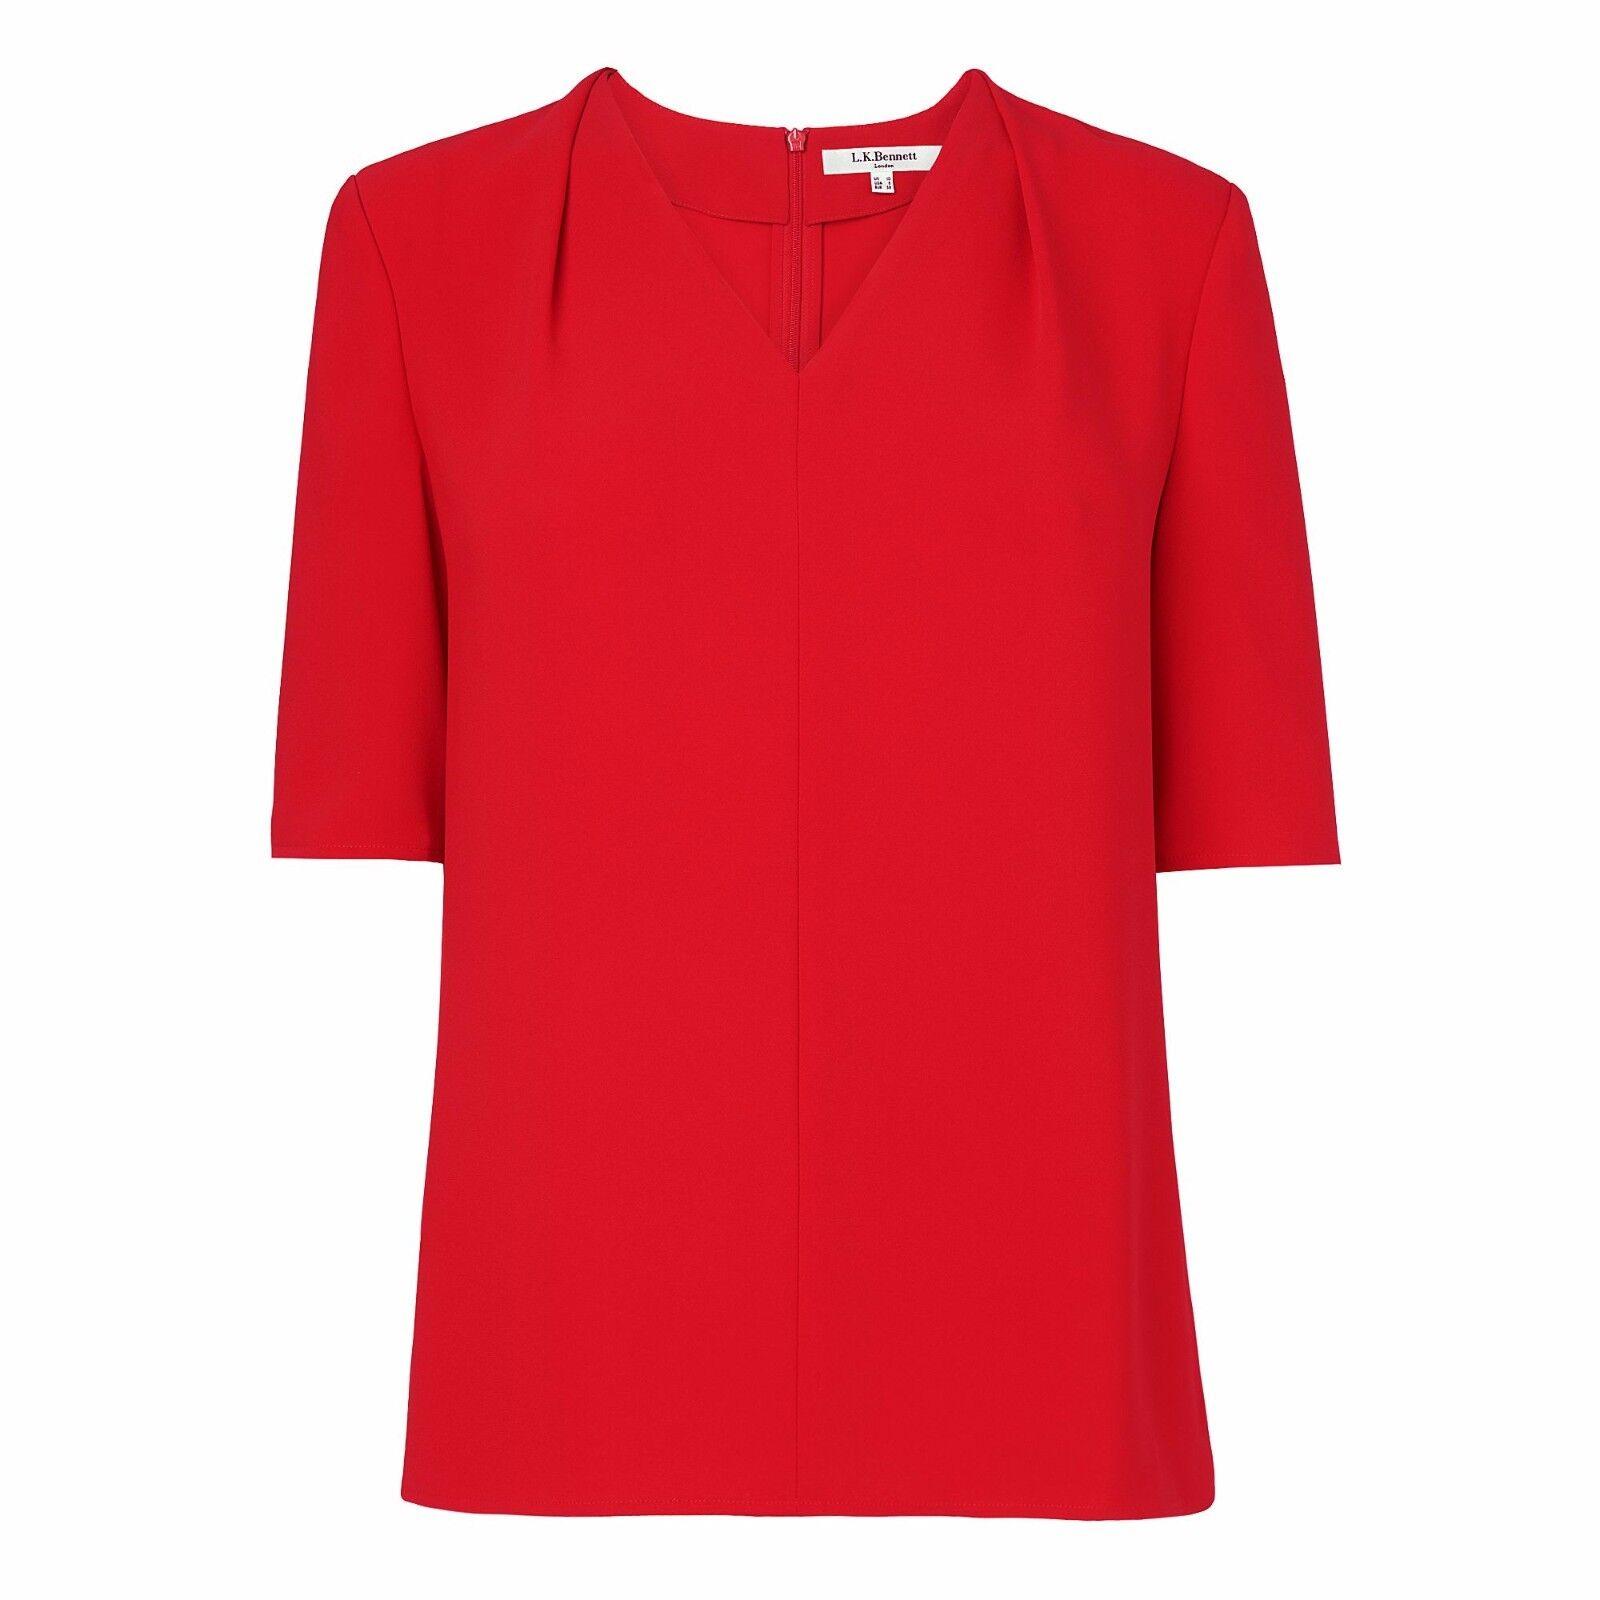 L.K.Bennett Women's Red Arlo Loose Fit Top - size